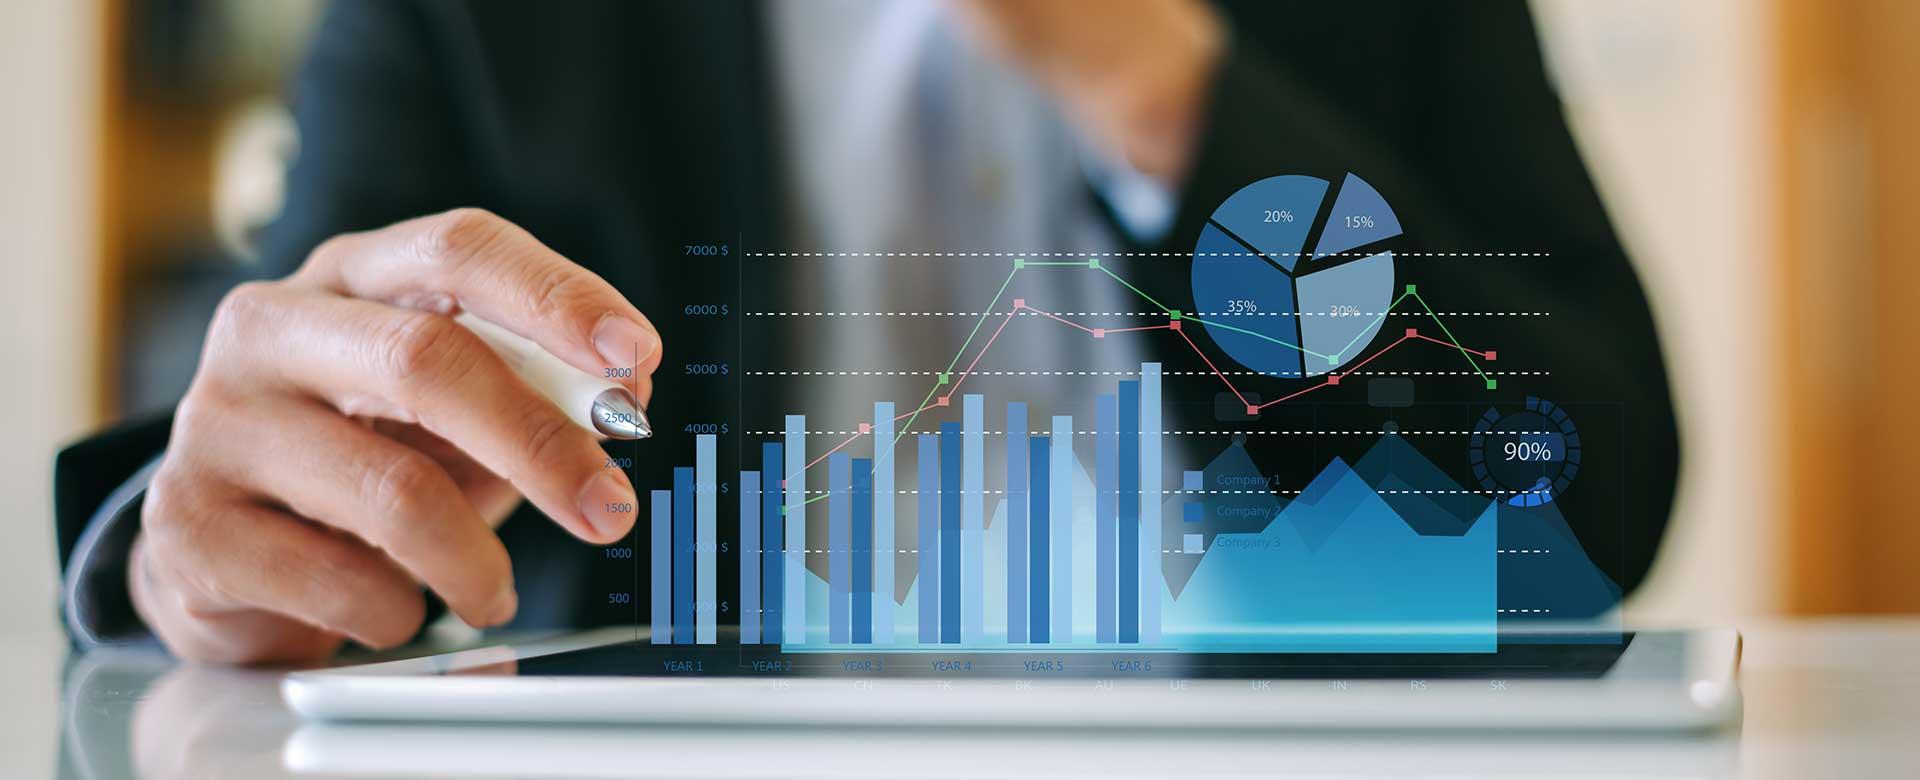 audit-assurance-accounting-firm.jpg